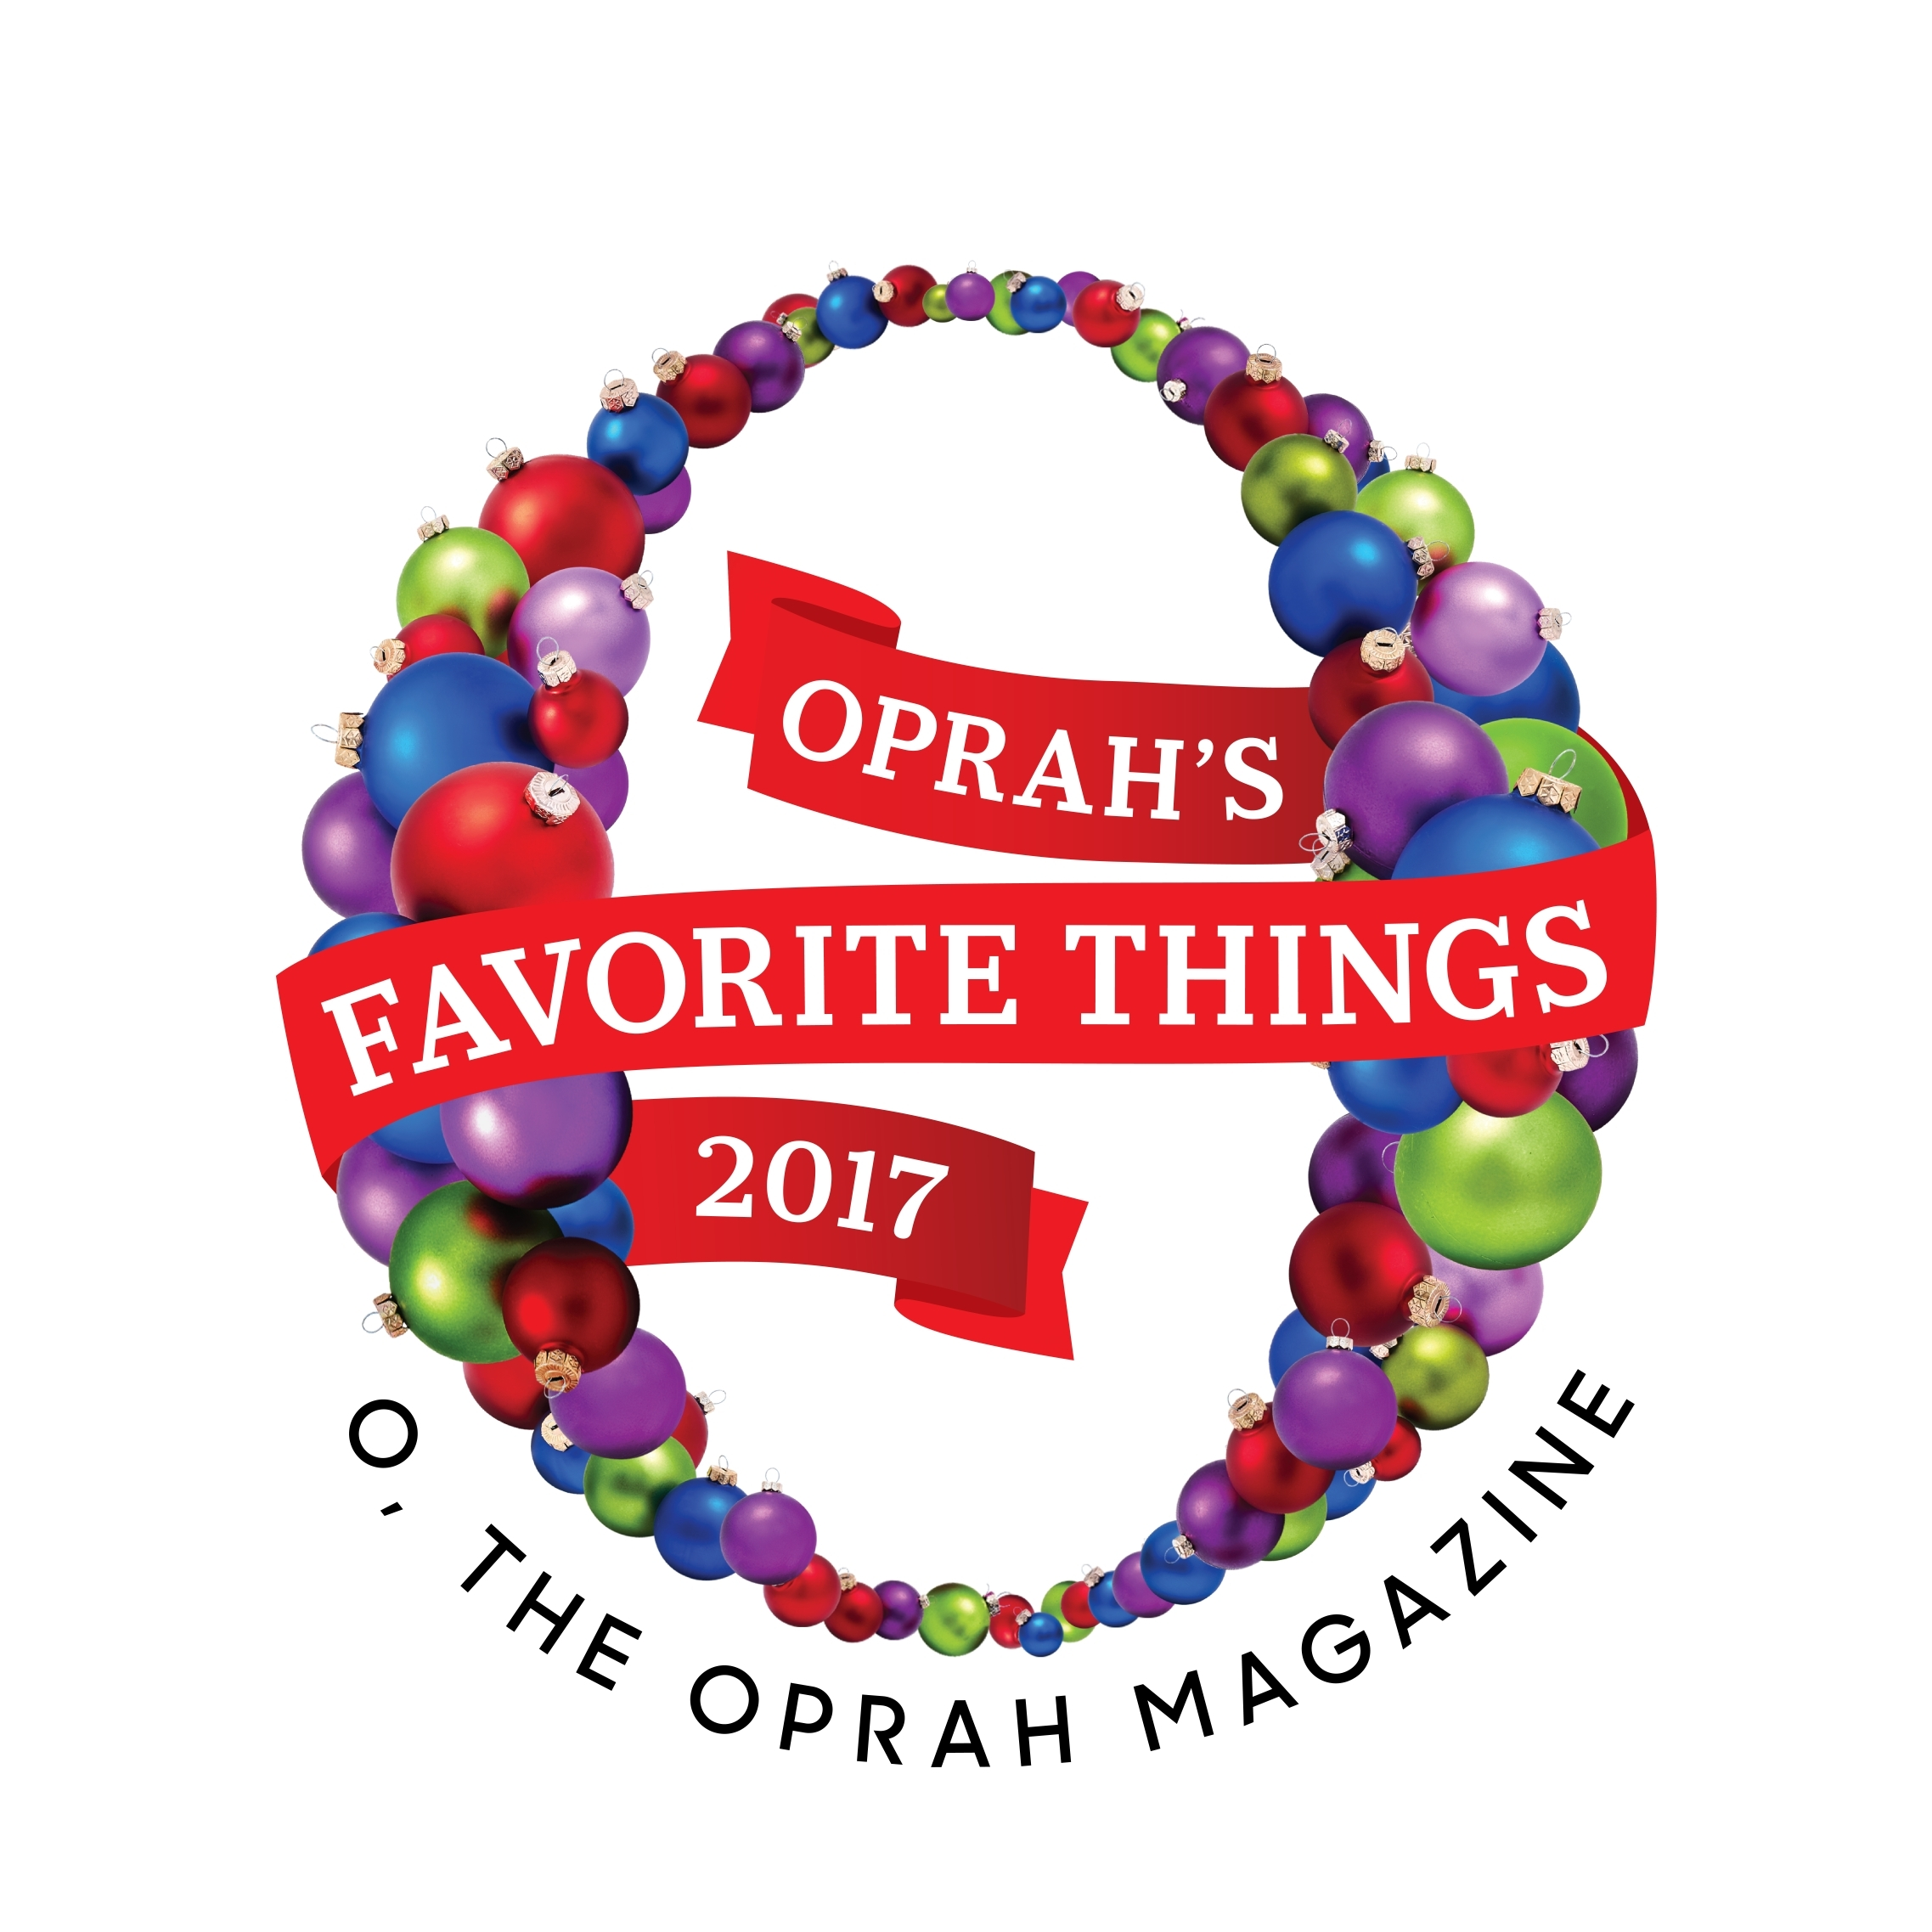 Oprahs Favorite Things